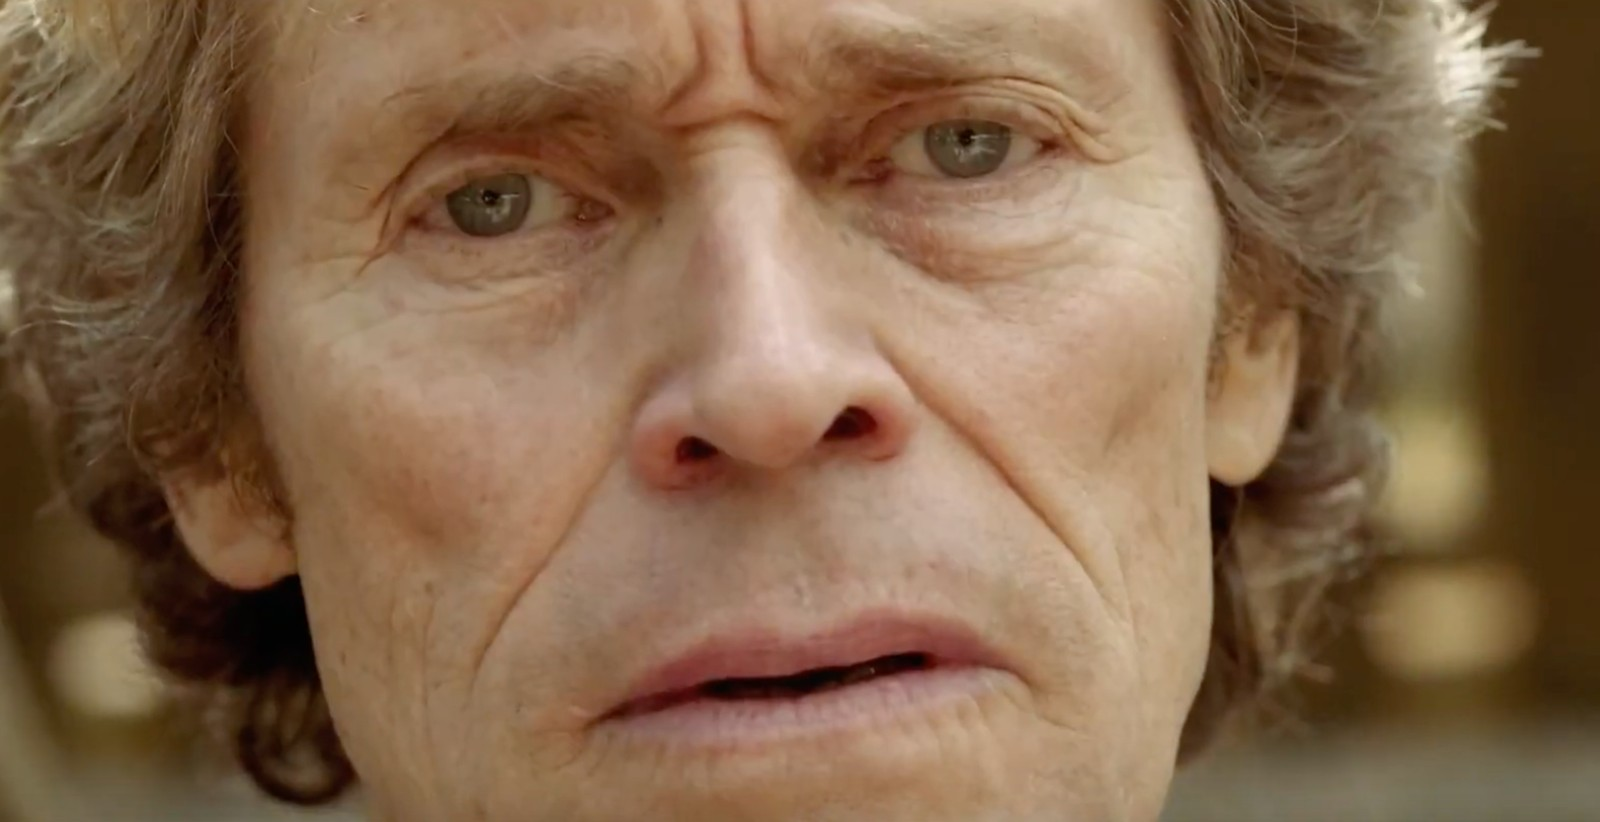 tommaso; abel ferrara; willem dafoe; filmas; apžvalga; Kanų kino festivalis; 2019; recenzija;